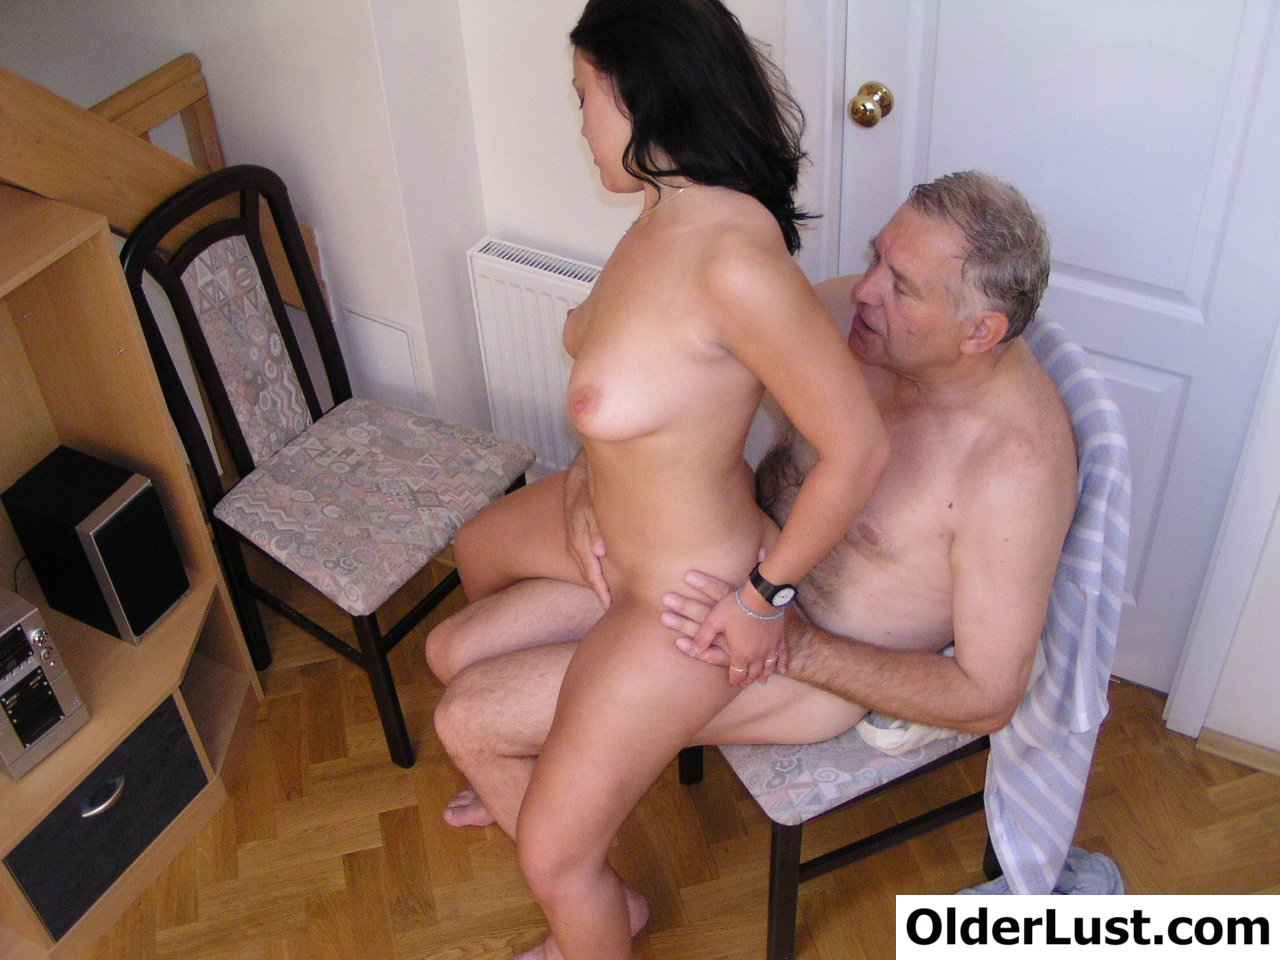 Порно семейное мама бабушка дочка папа дедушка сын